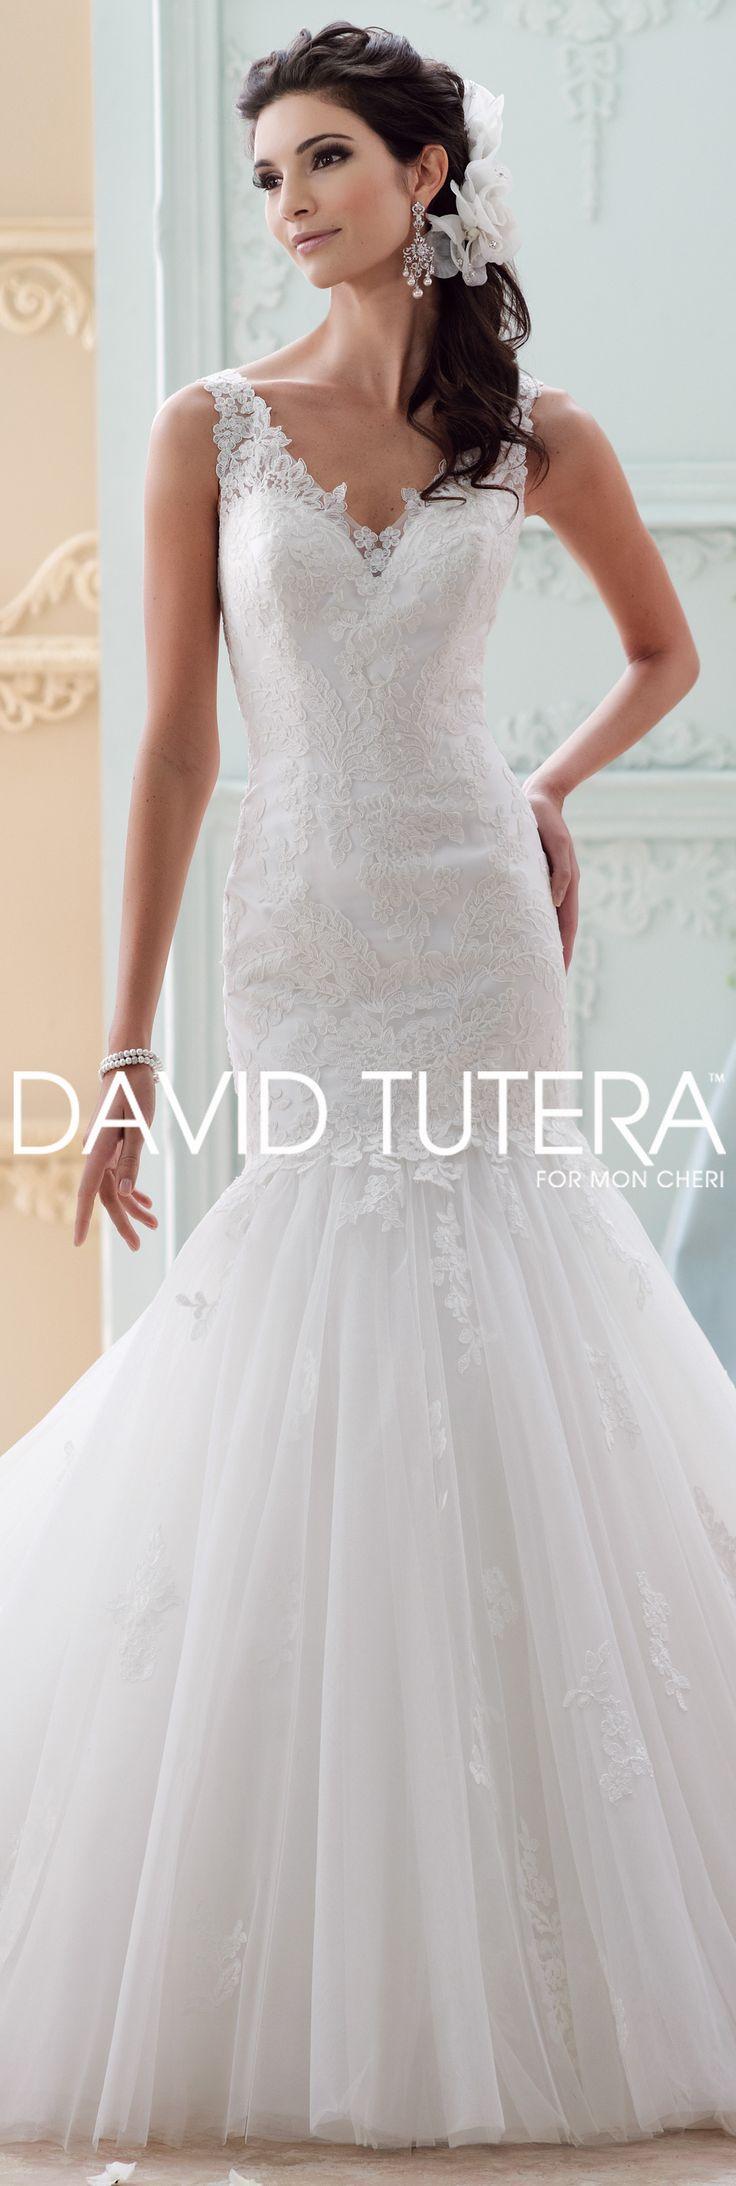 David Tutera Wedding Dresses Houston : David tutera wedding dresses for mon cheri bridal the o jays